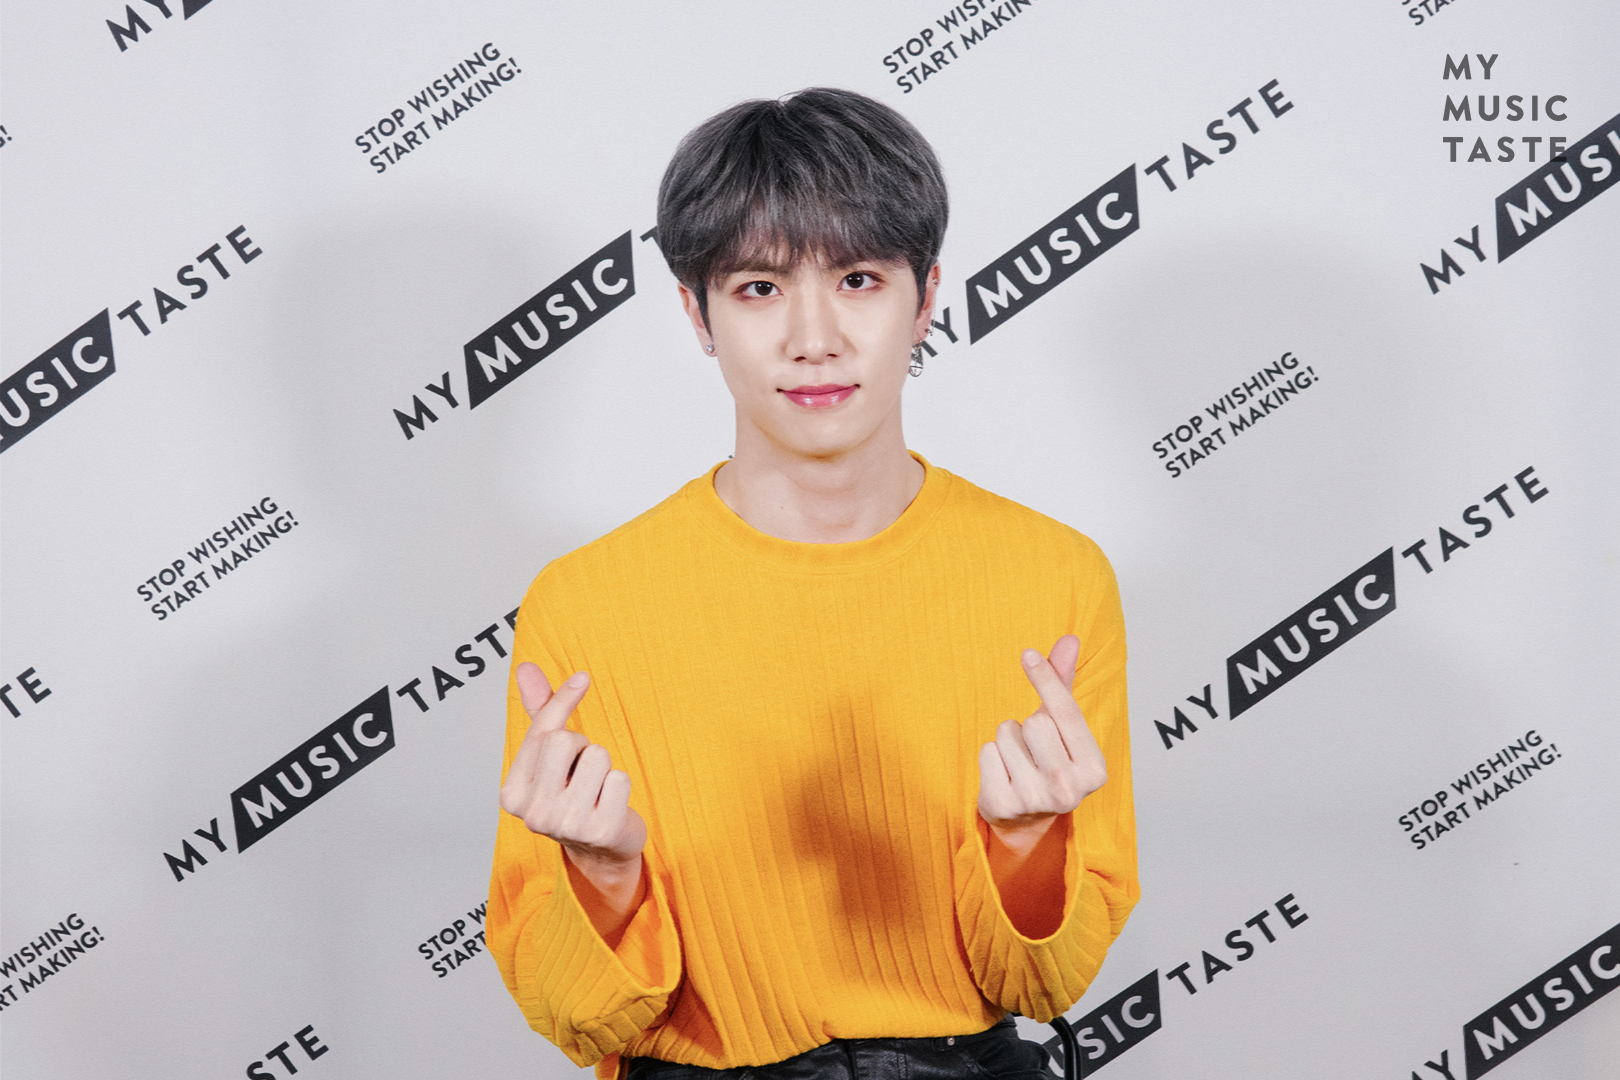 [KIM DONG HAN 2019] Blog Interview Photo_01.jpg